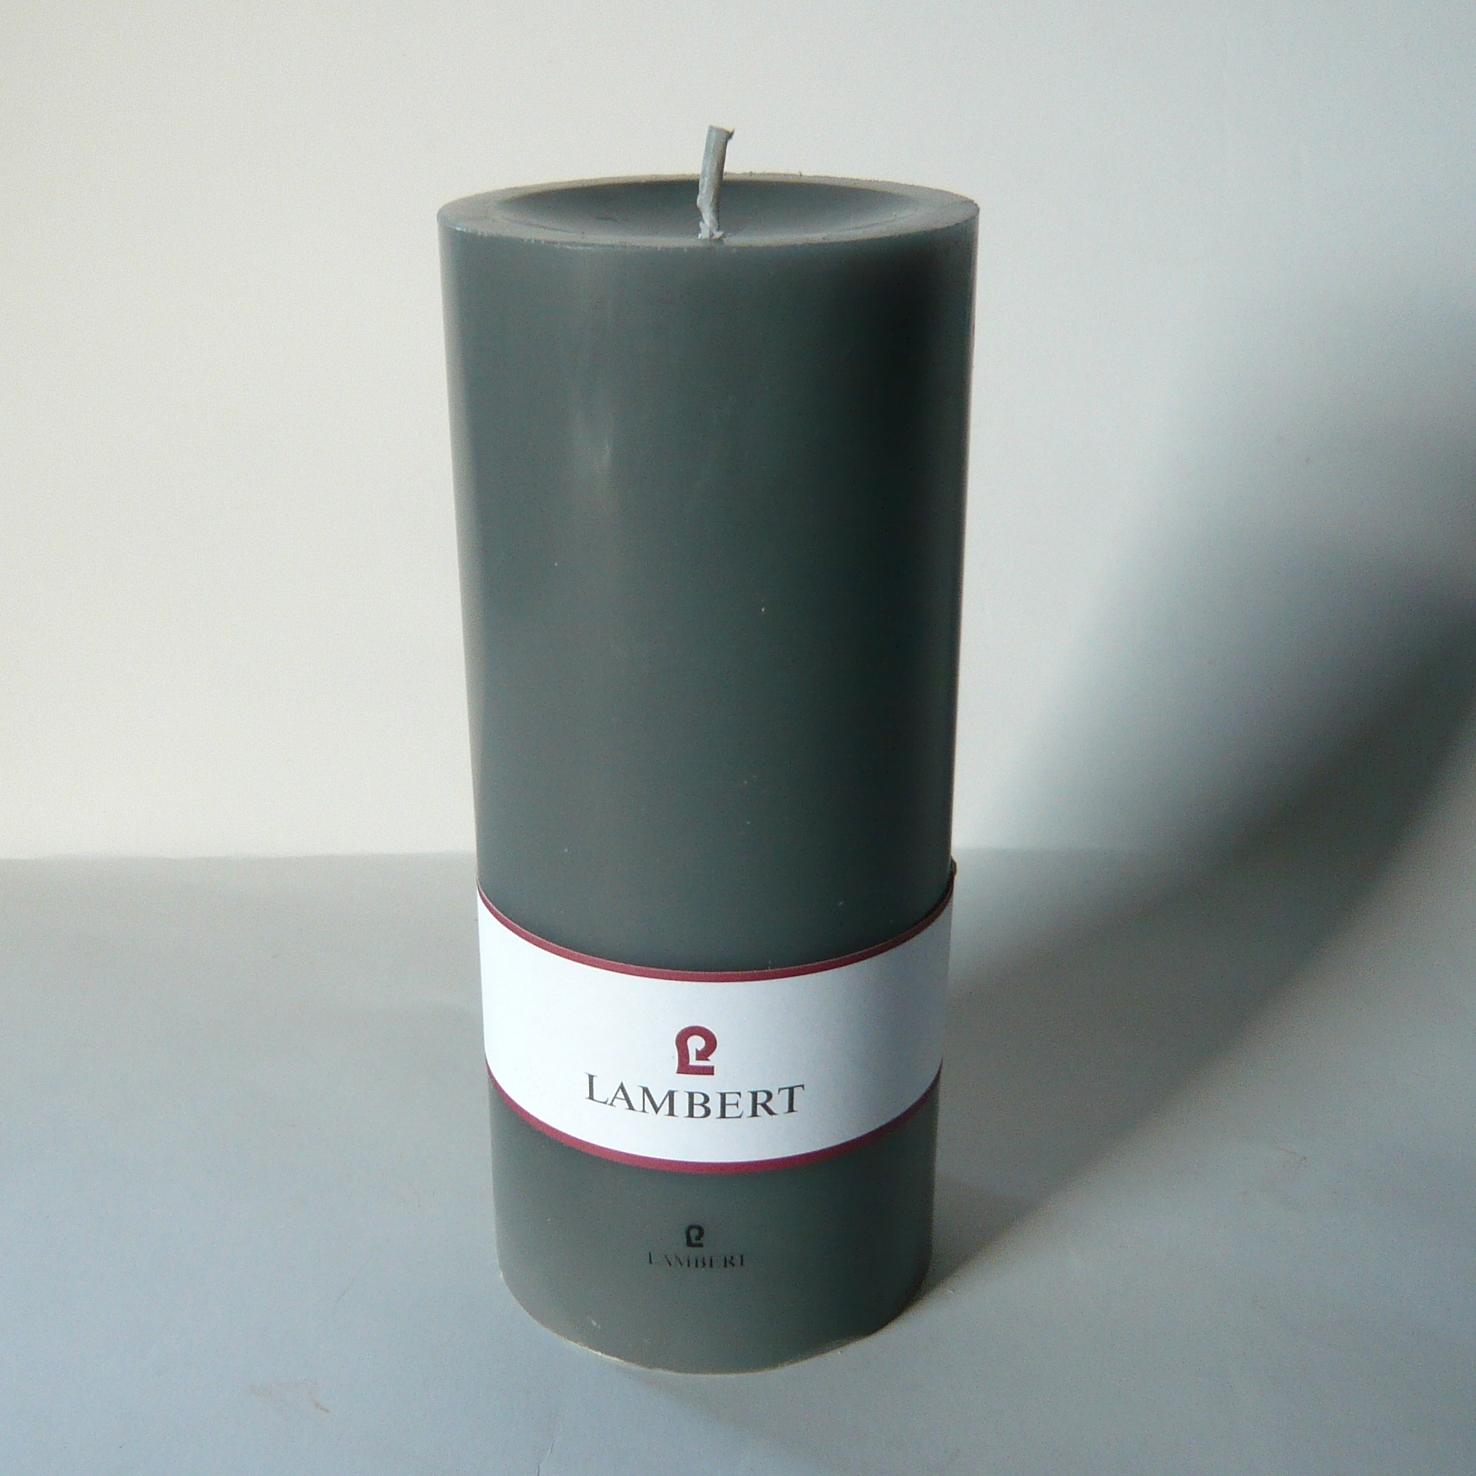 lambert stab stumpenkerzen durchmesser 3 8 cm setpreis. Black Bedroom Furniture Sets. Home Design Ideas